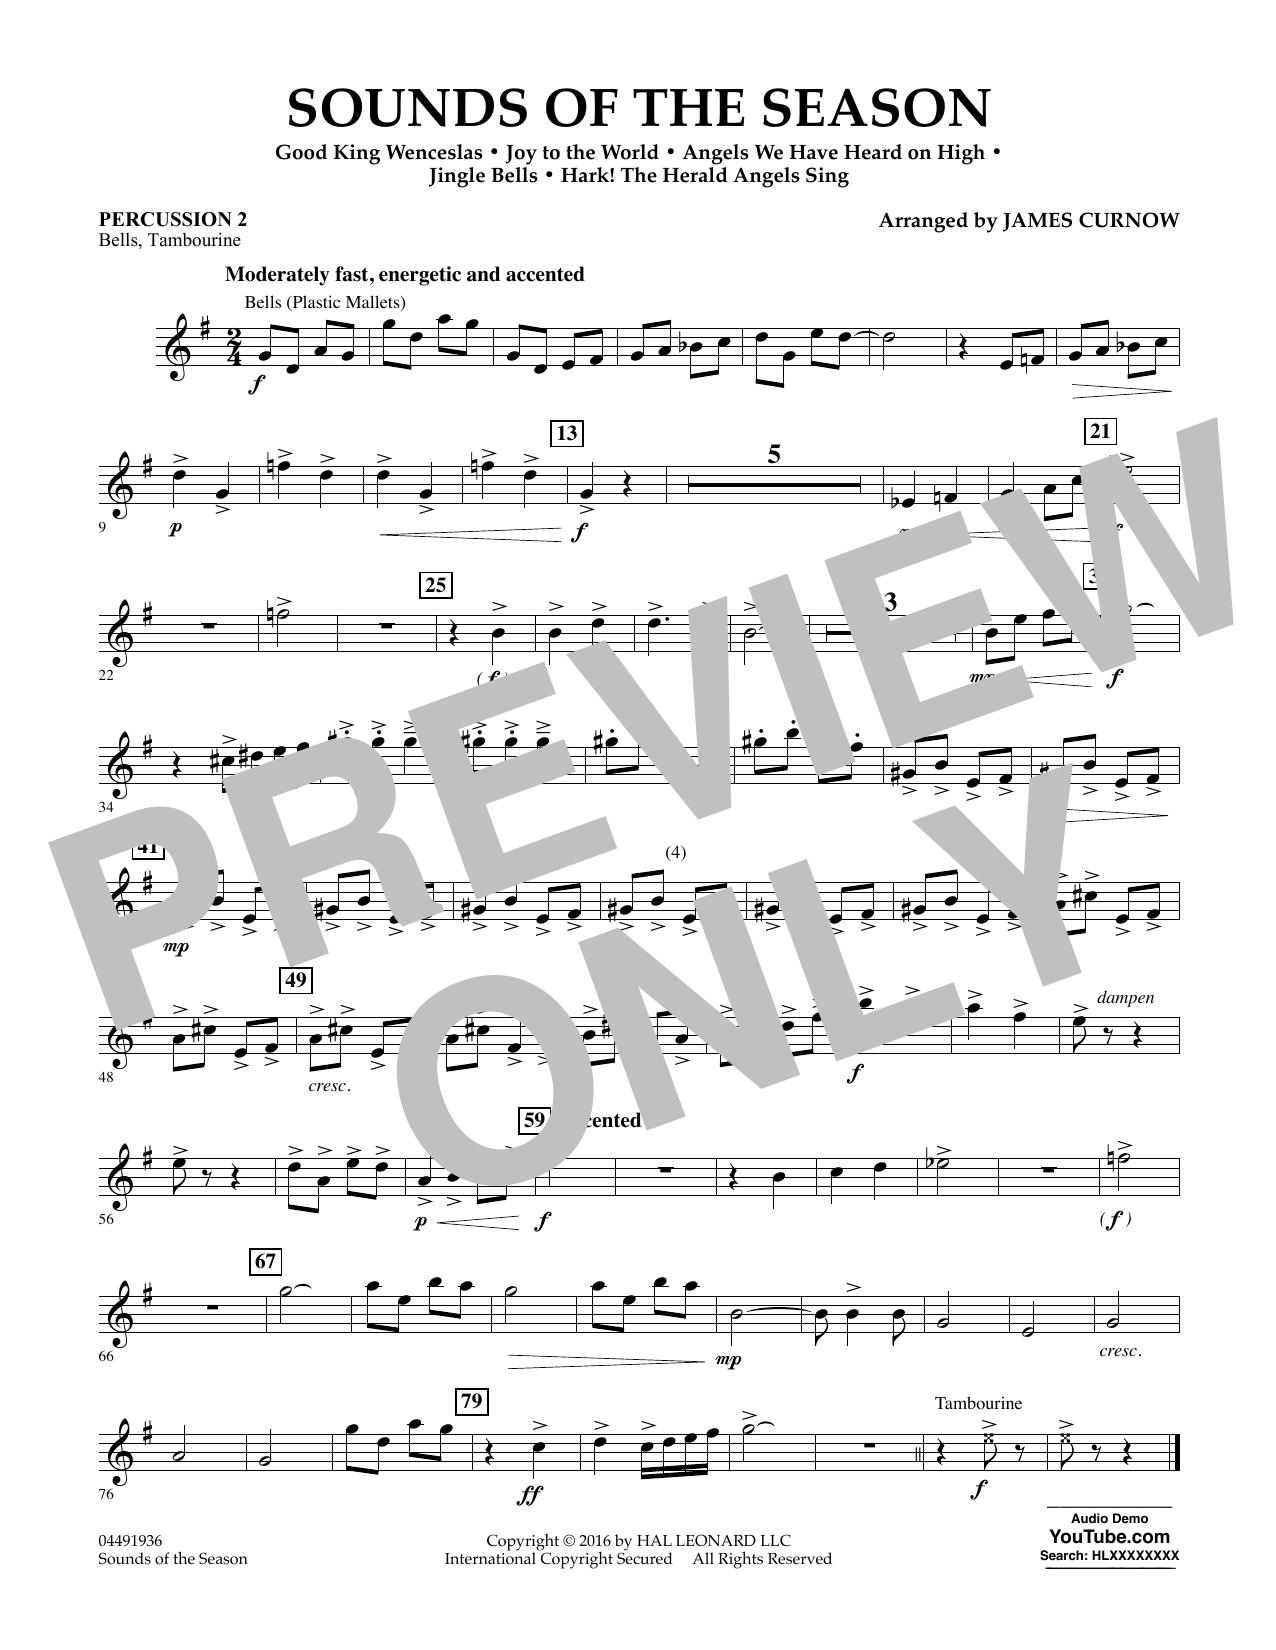 Sounds of the Season - Percussion 2